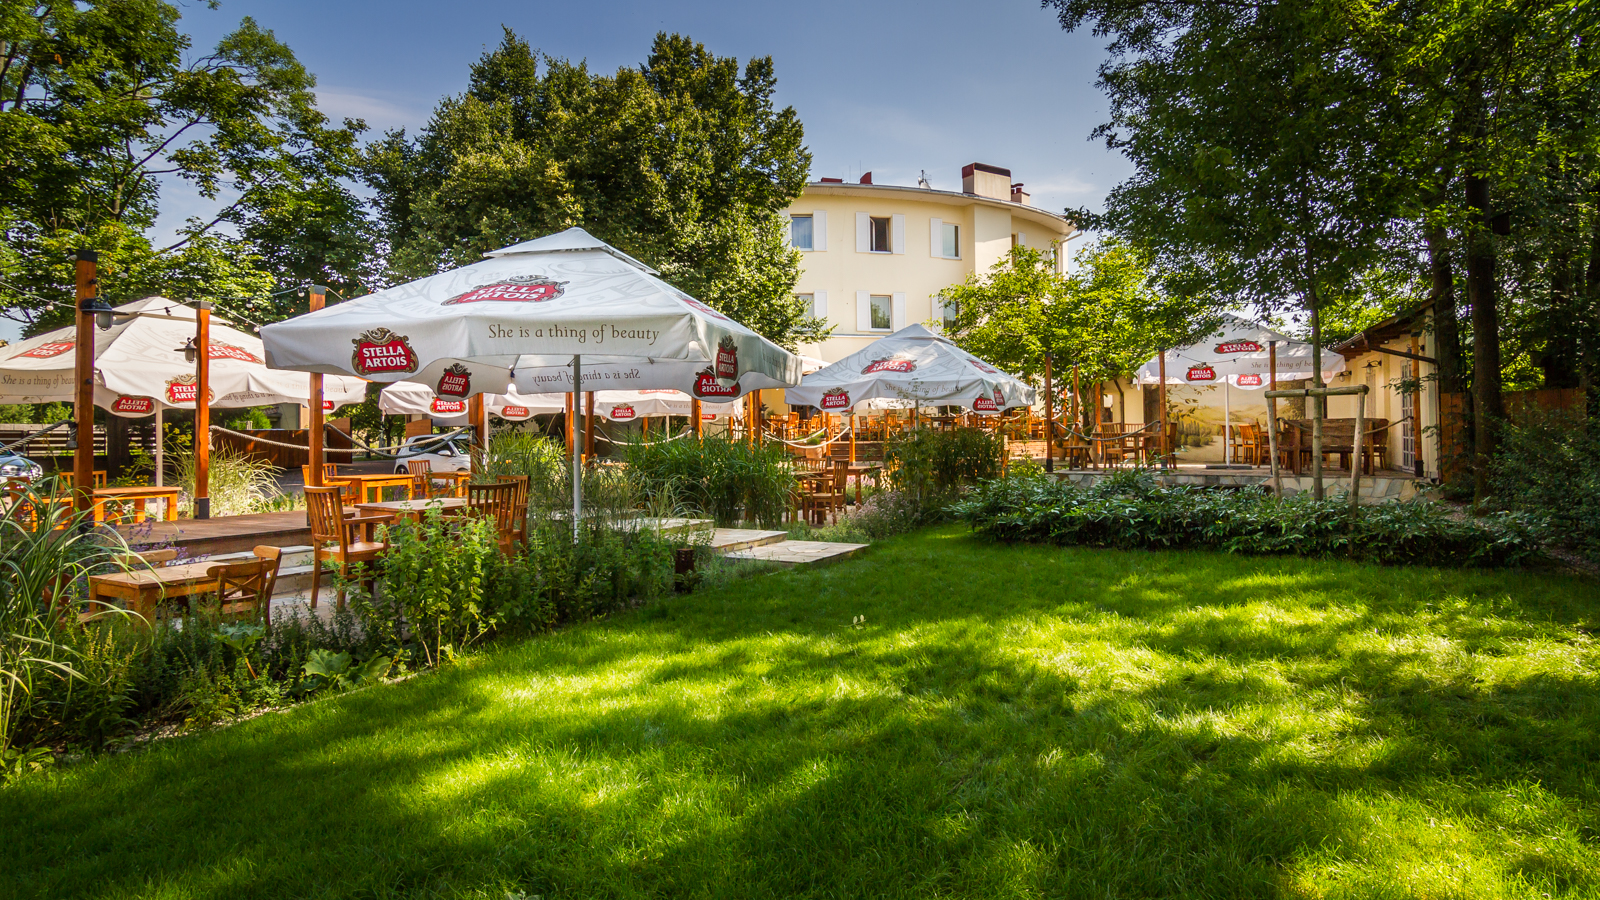 Villa St. Tropez-14-1.jpg